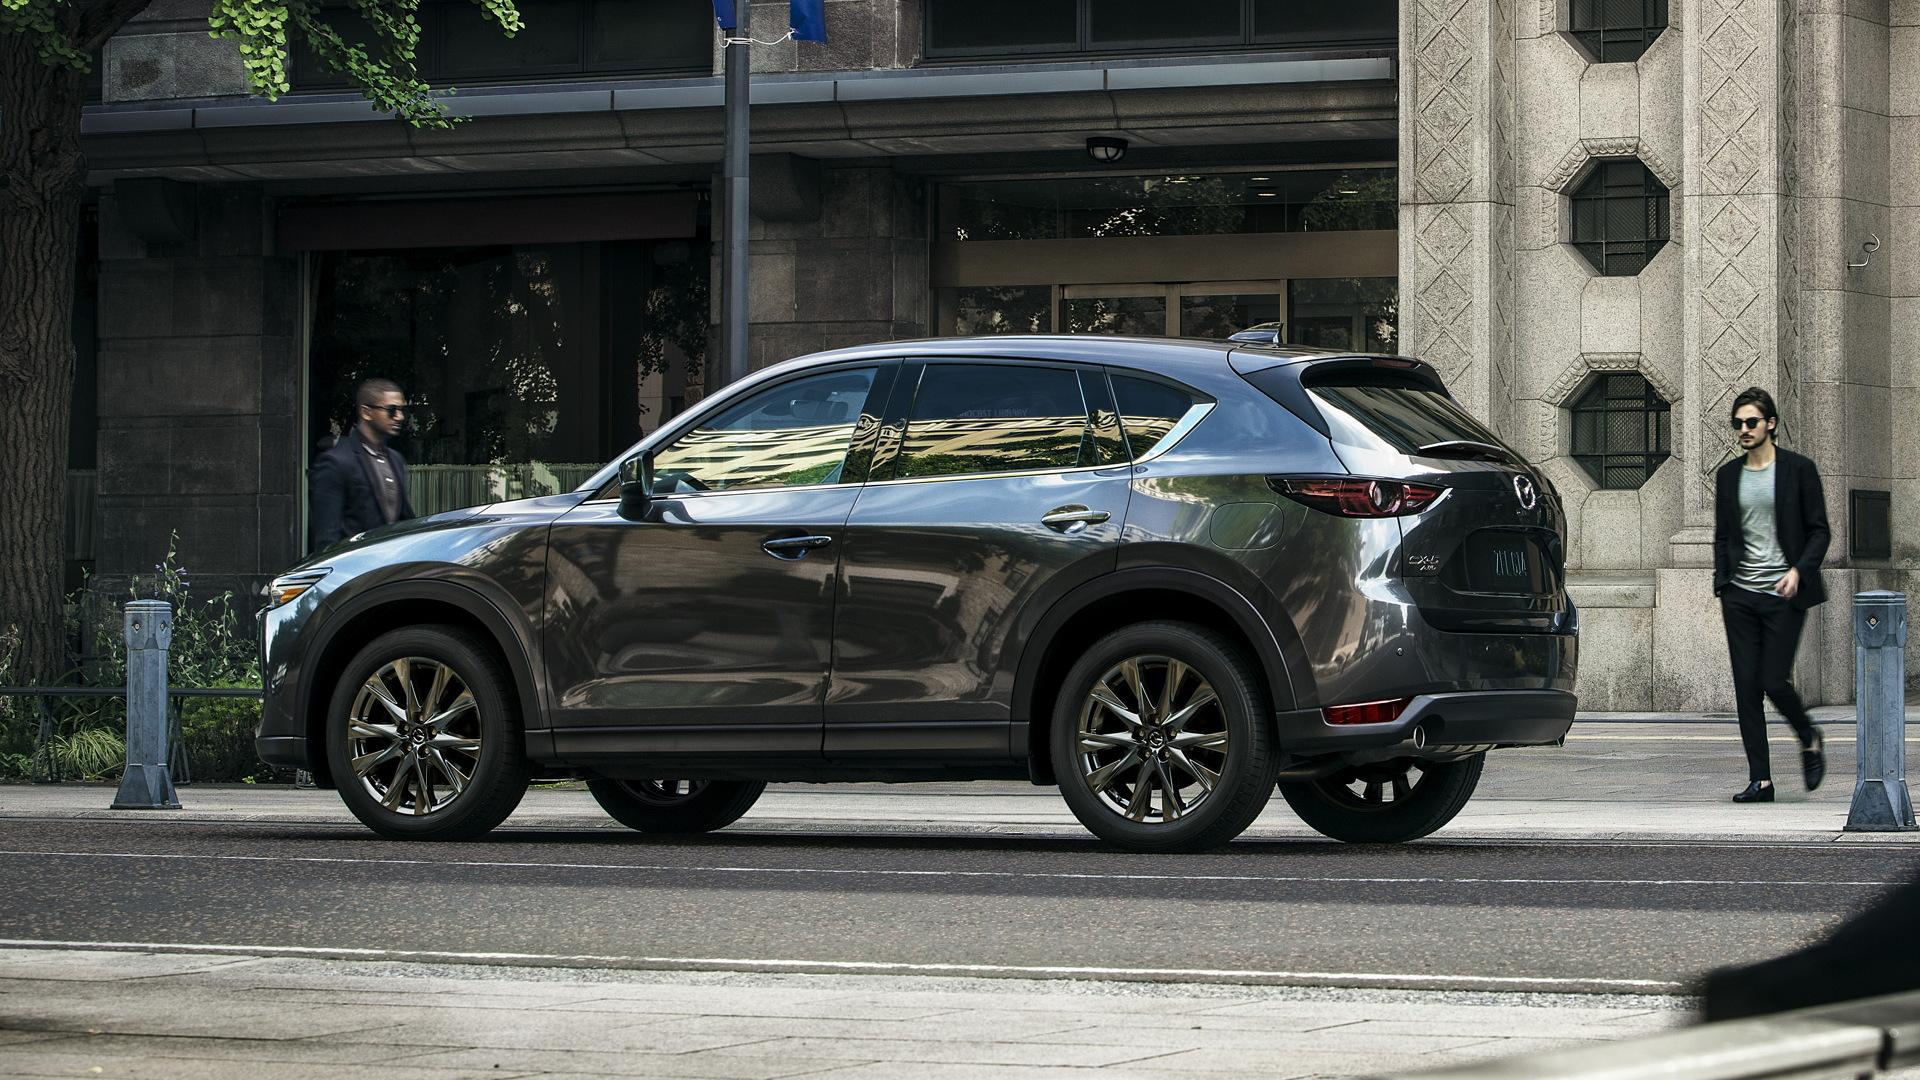 2019 Mazda Cx 5 Gets Punchy 2 5 Liter Turbo Gvc Plus Handling